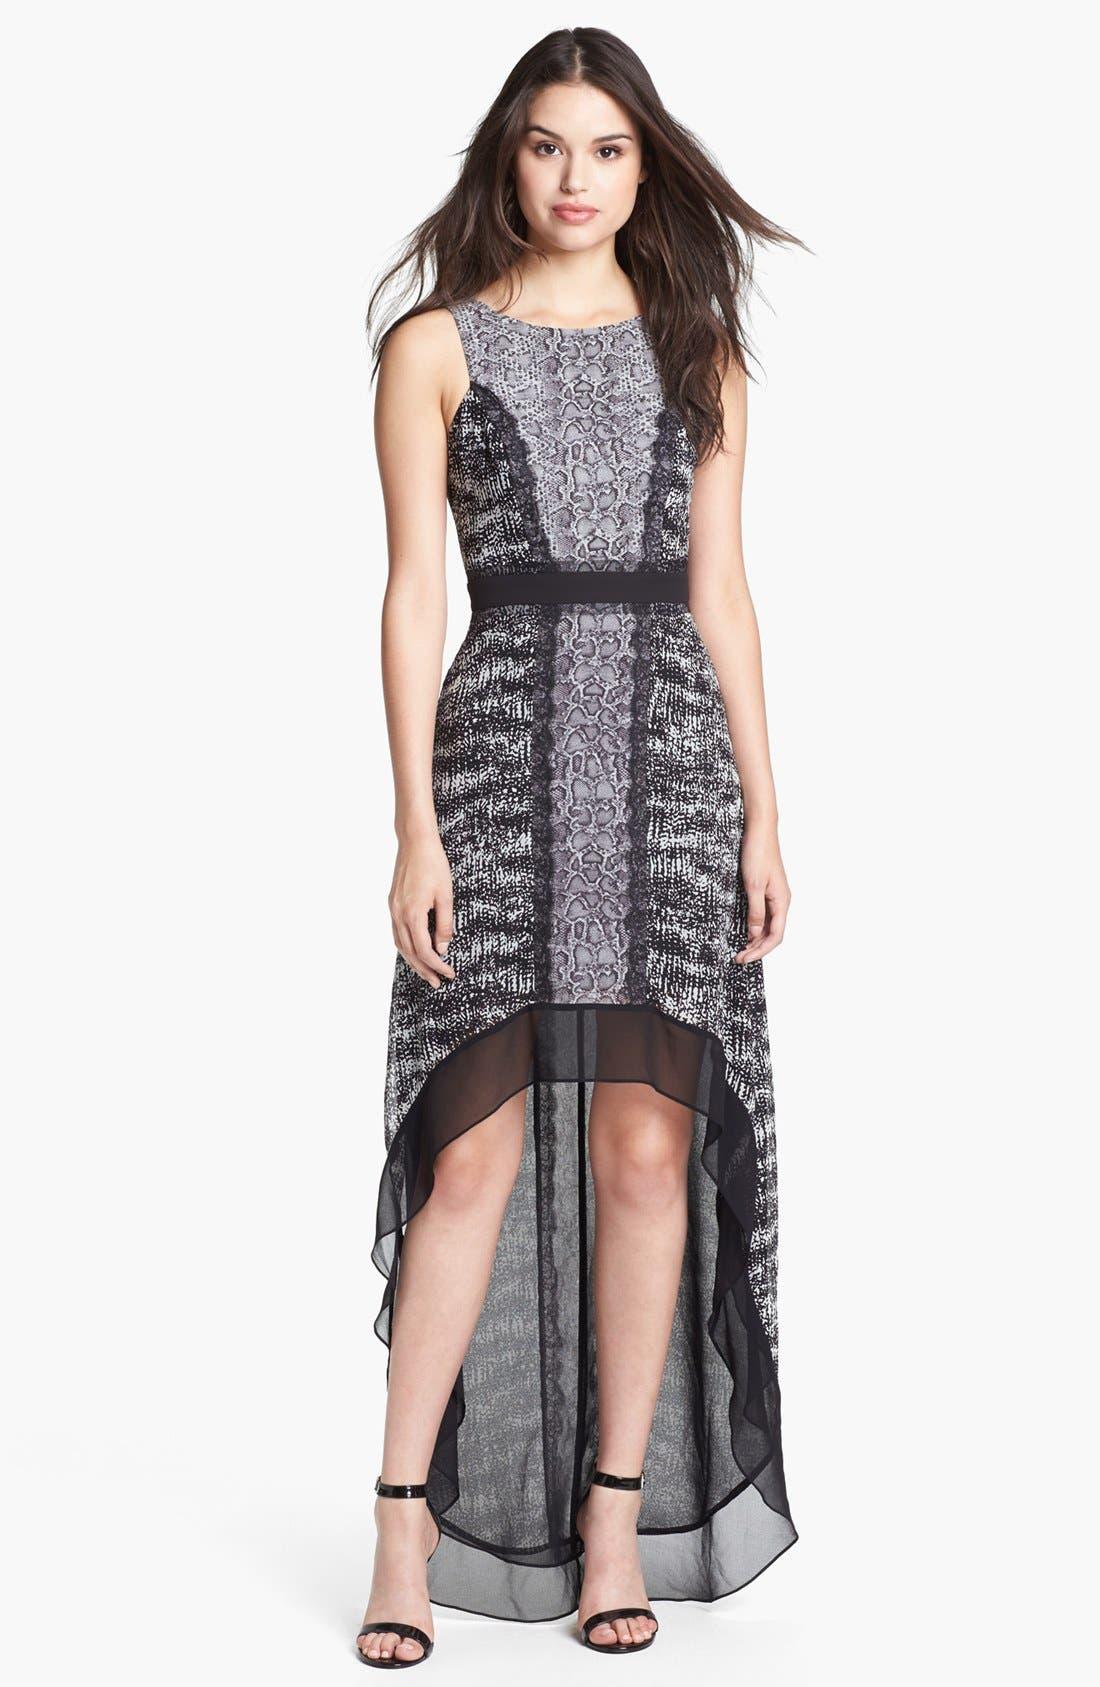 Main Image - BCBGMAXAZRIA Mixed Print High/Low Chiffon Dress